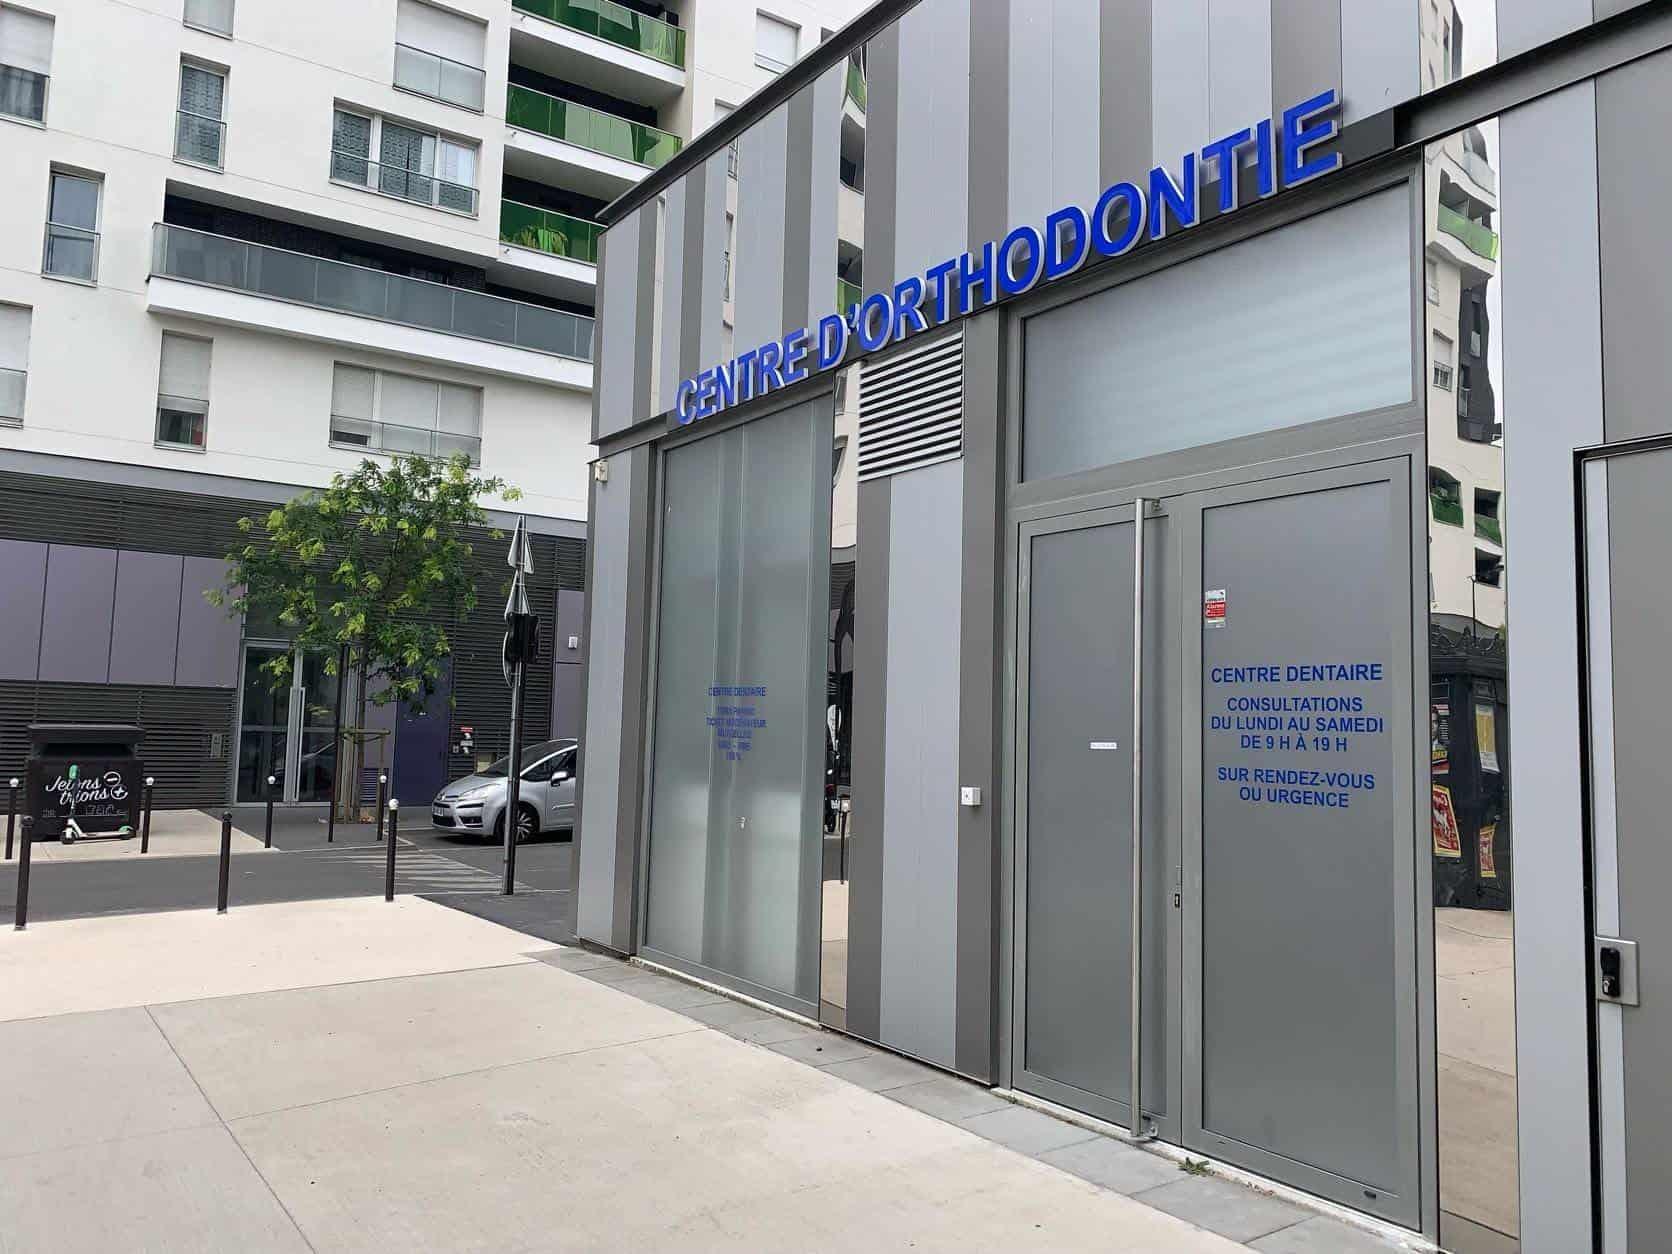 Centre Dentaire Dentotop Ivry sur Seine